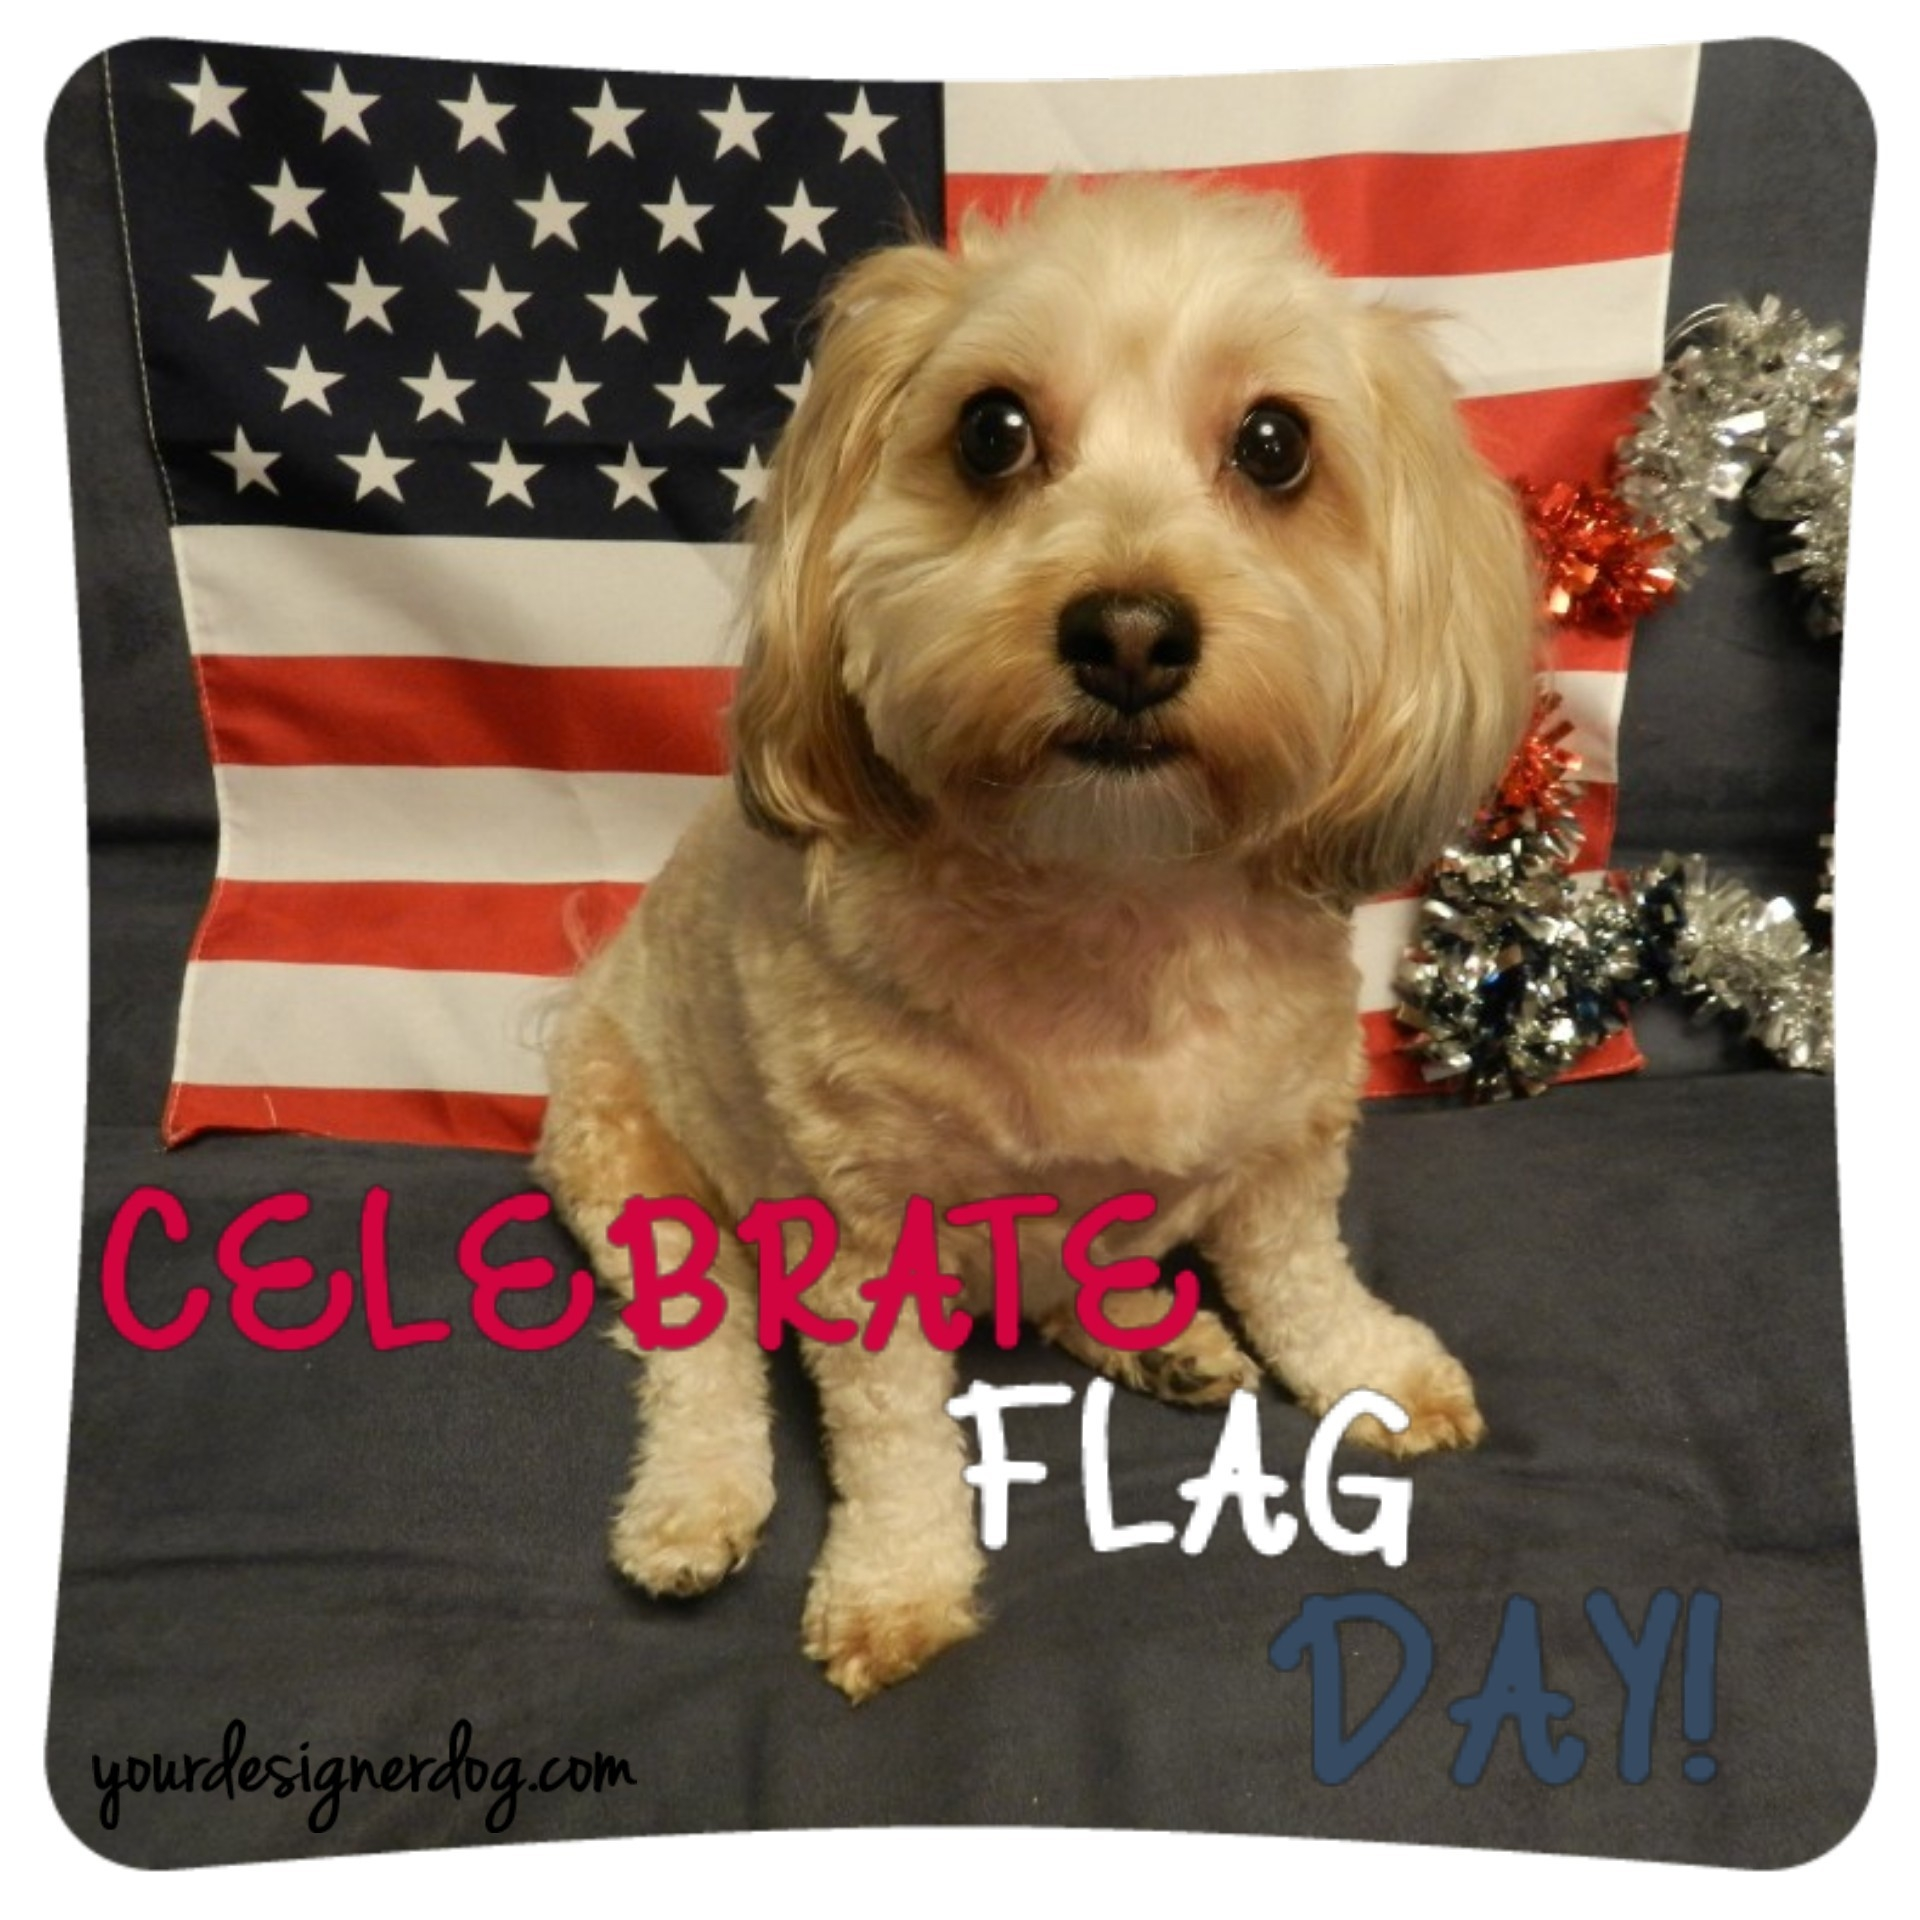 Celebrate Flag Day!